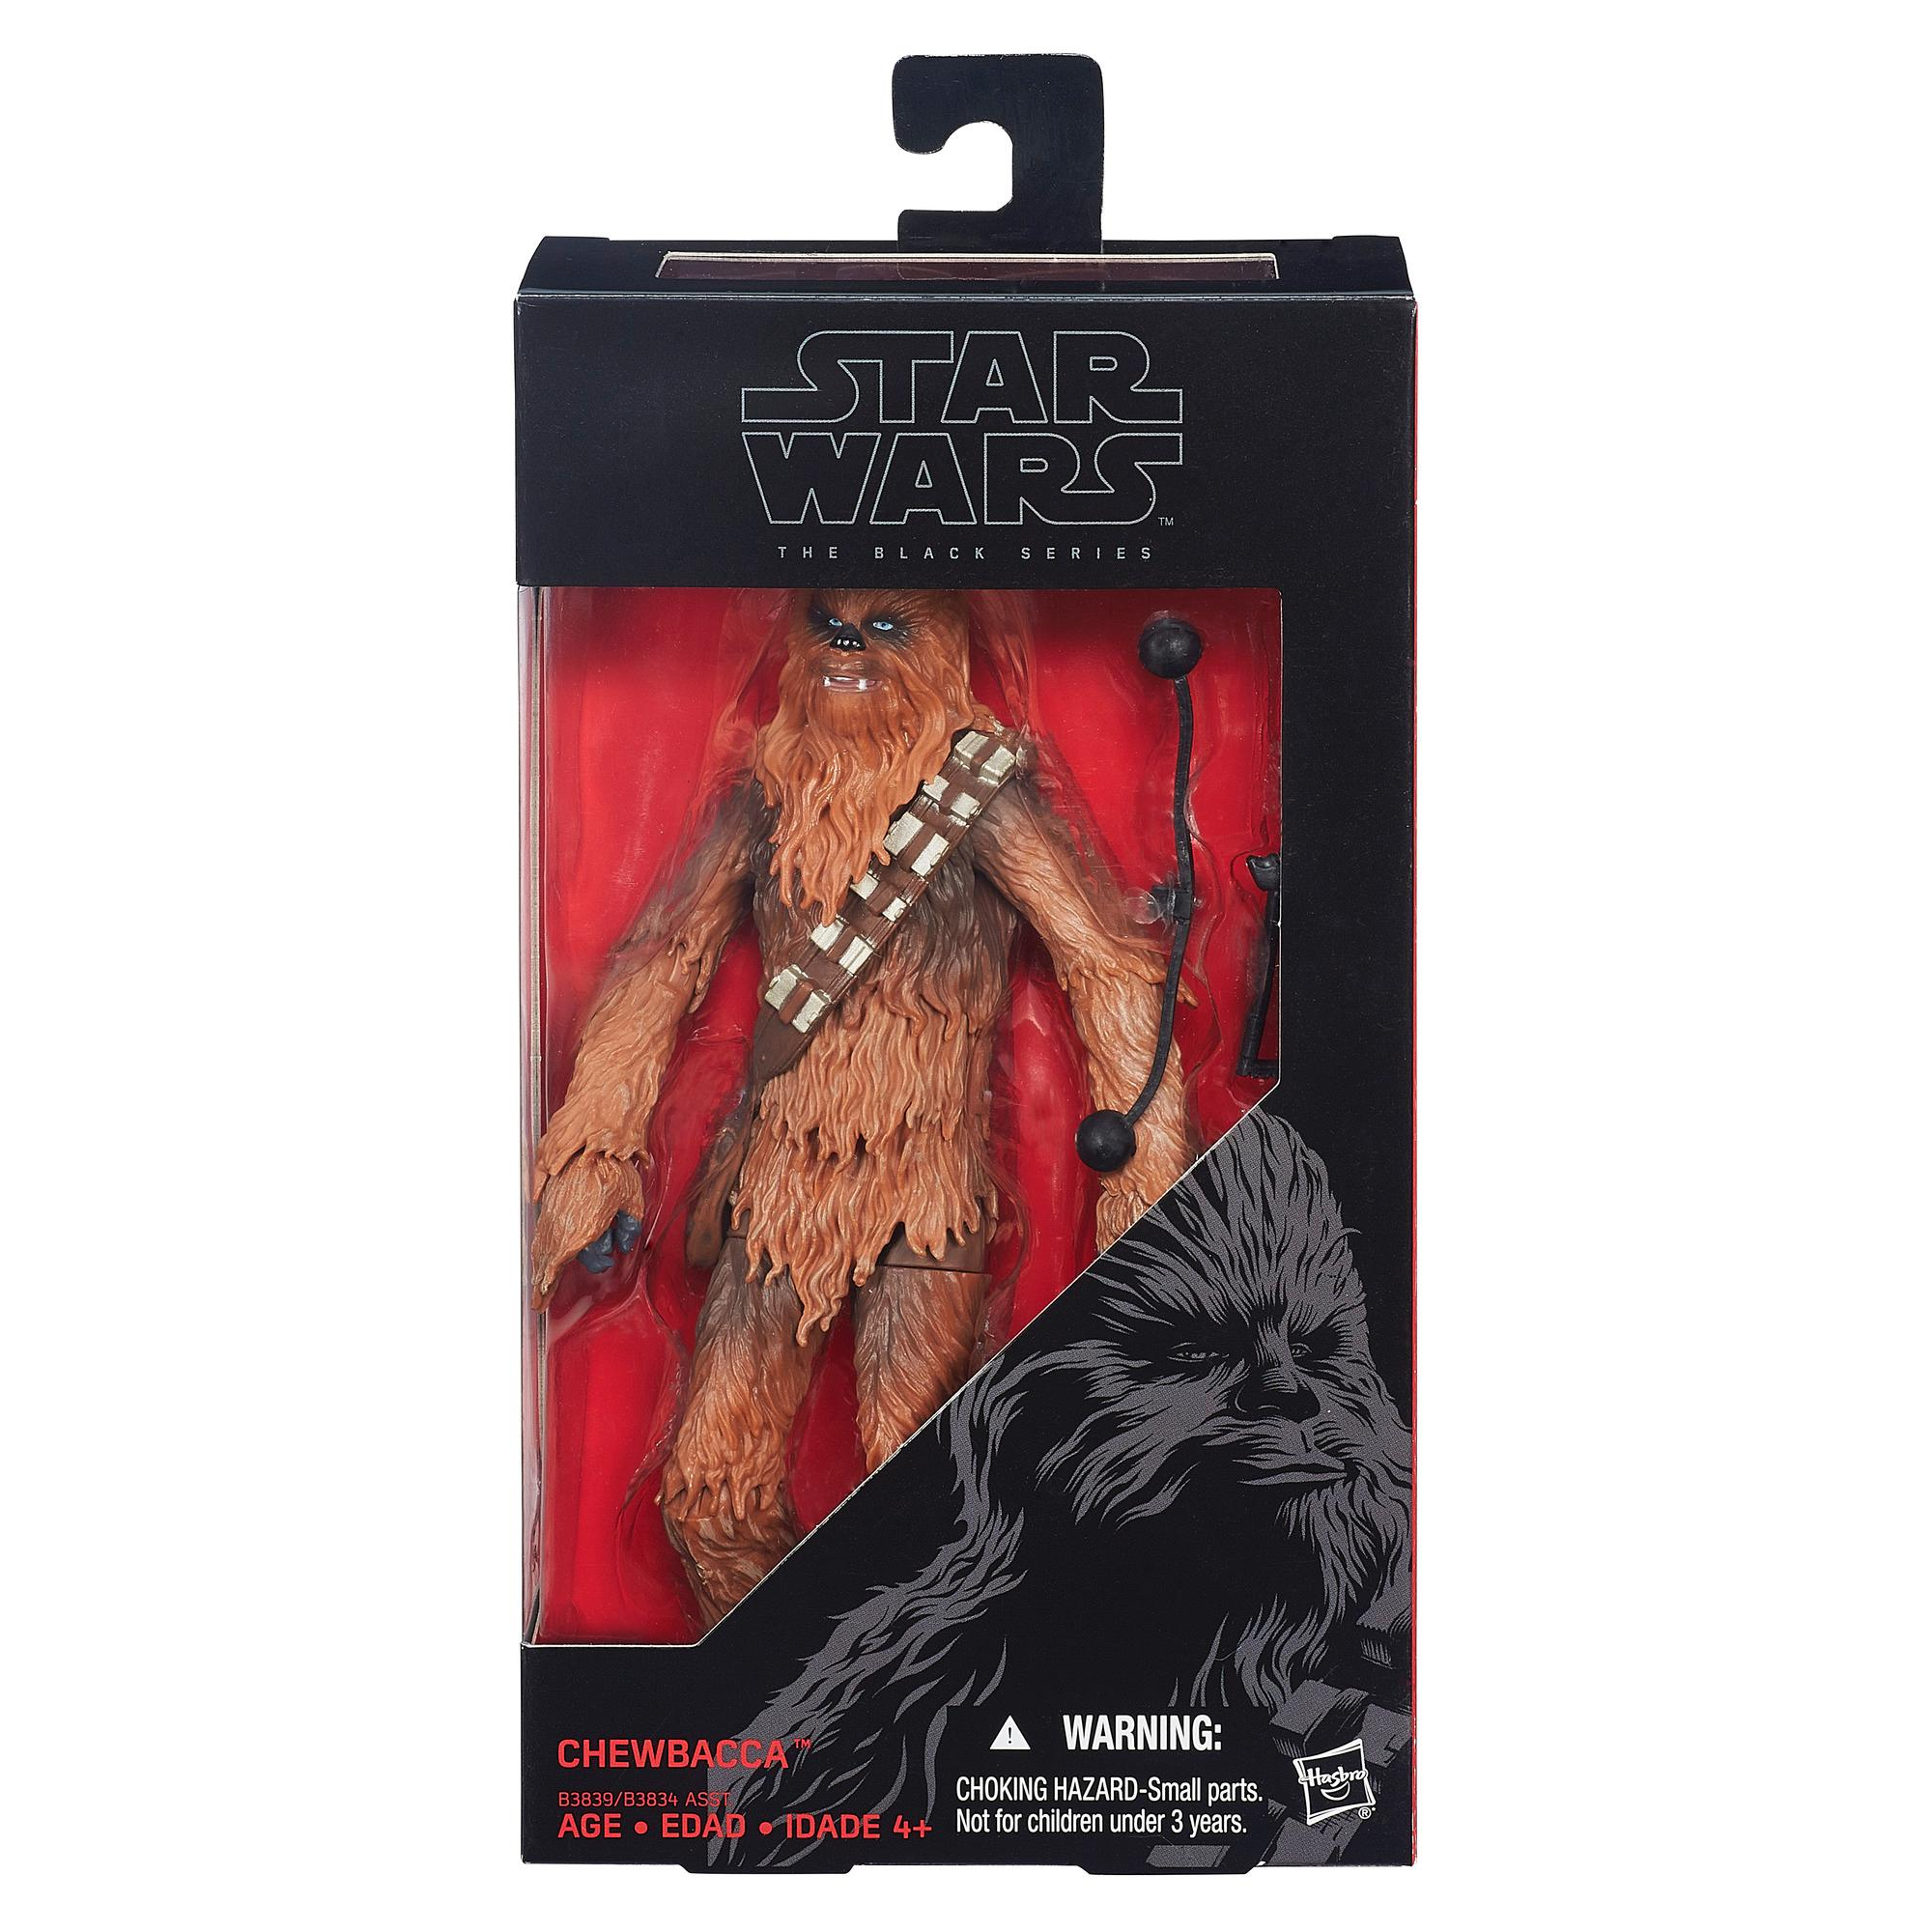 Star Wars - Chewbacca de 15,25 cm Black Series